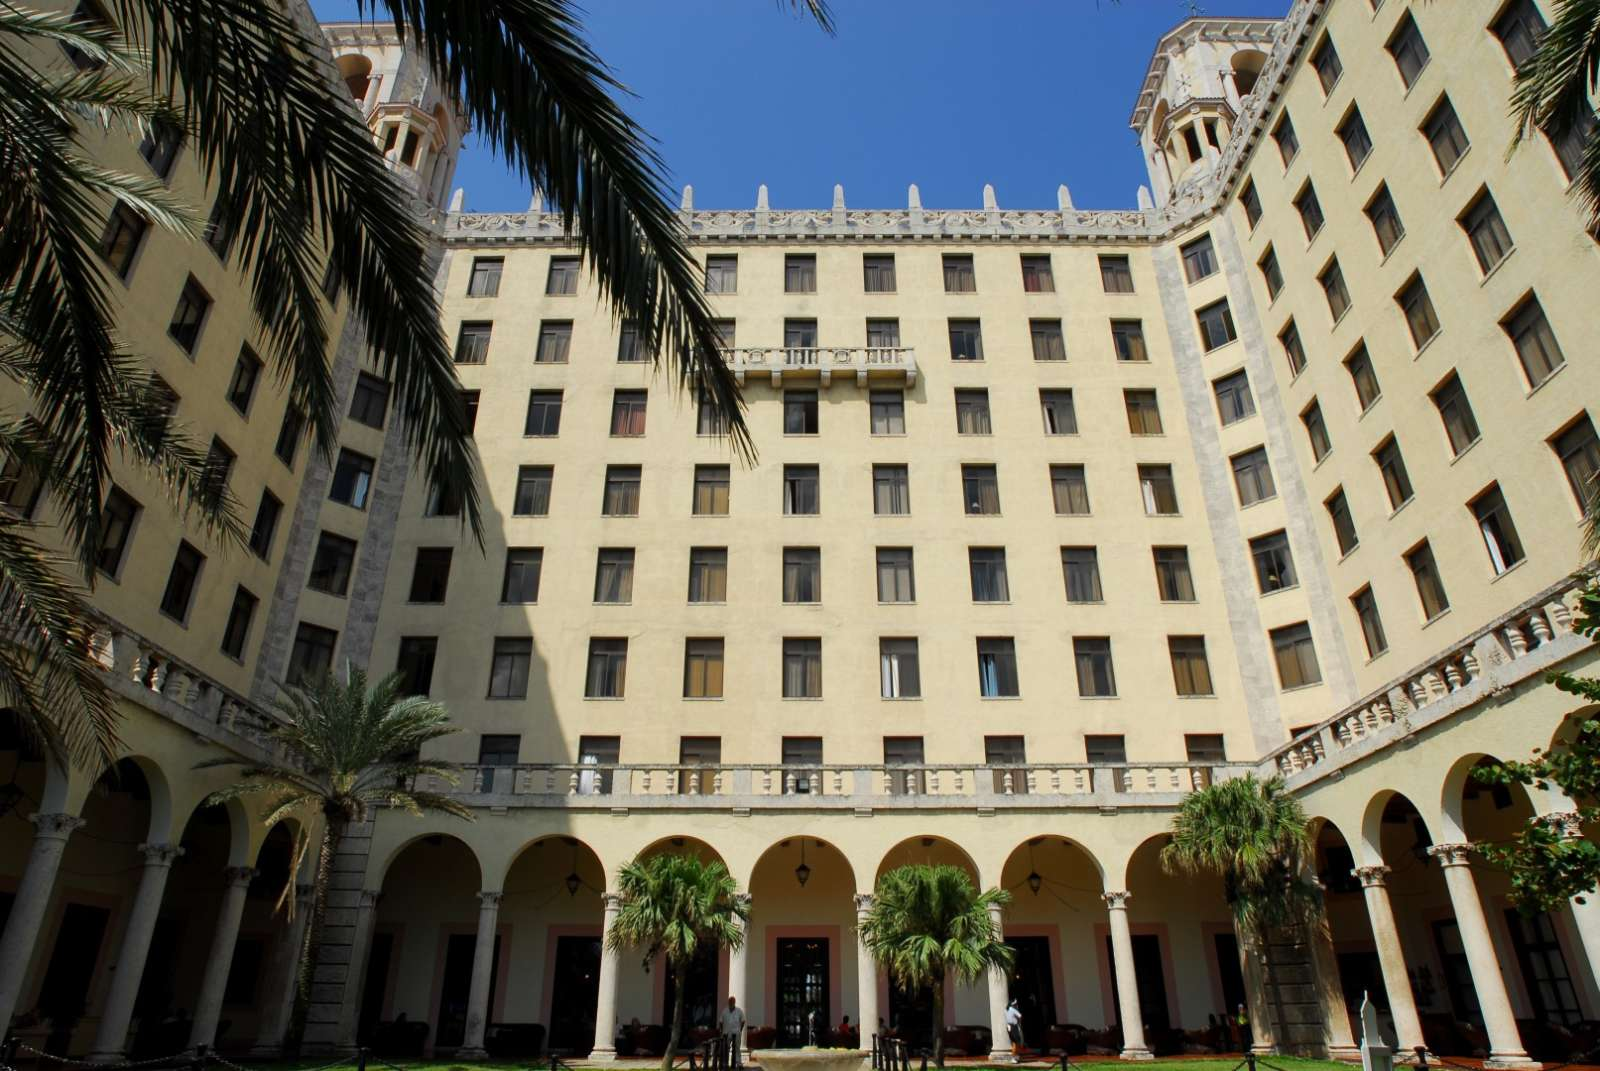 Interior of the Hotel Nacional in Havana, Cuba